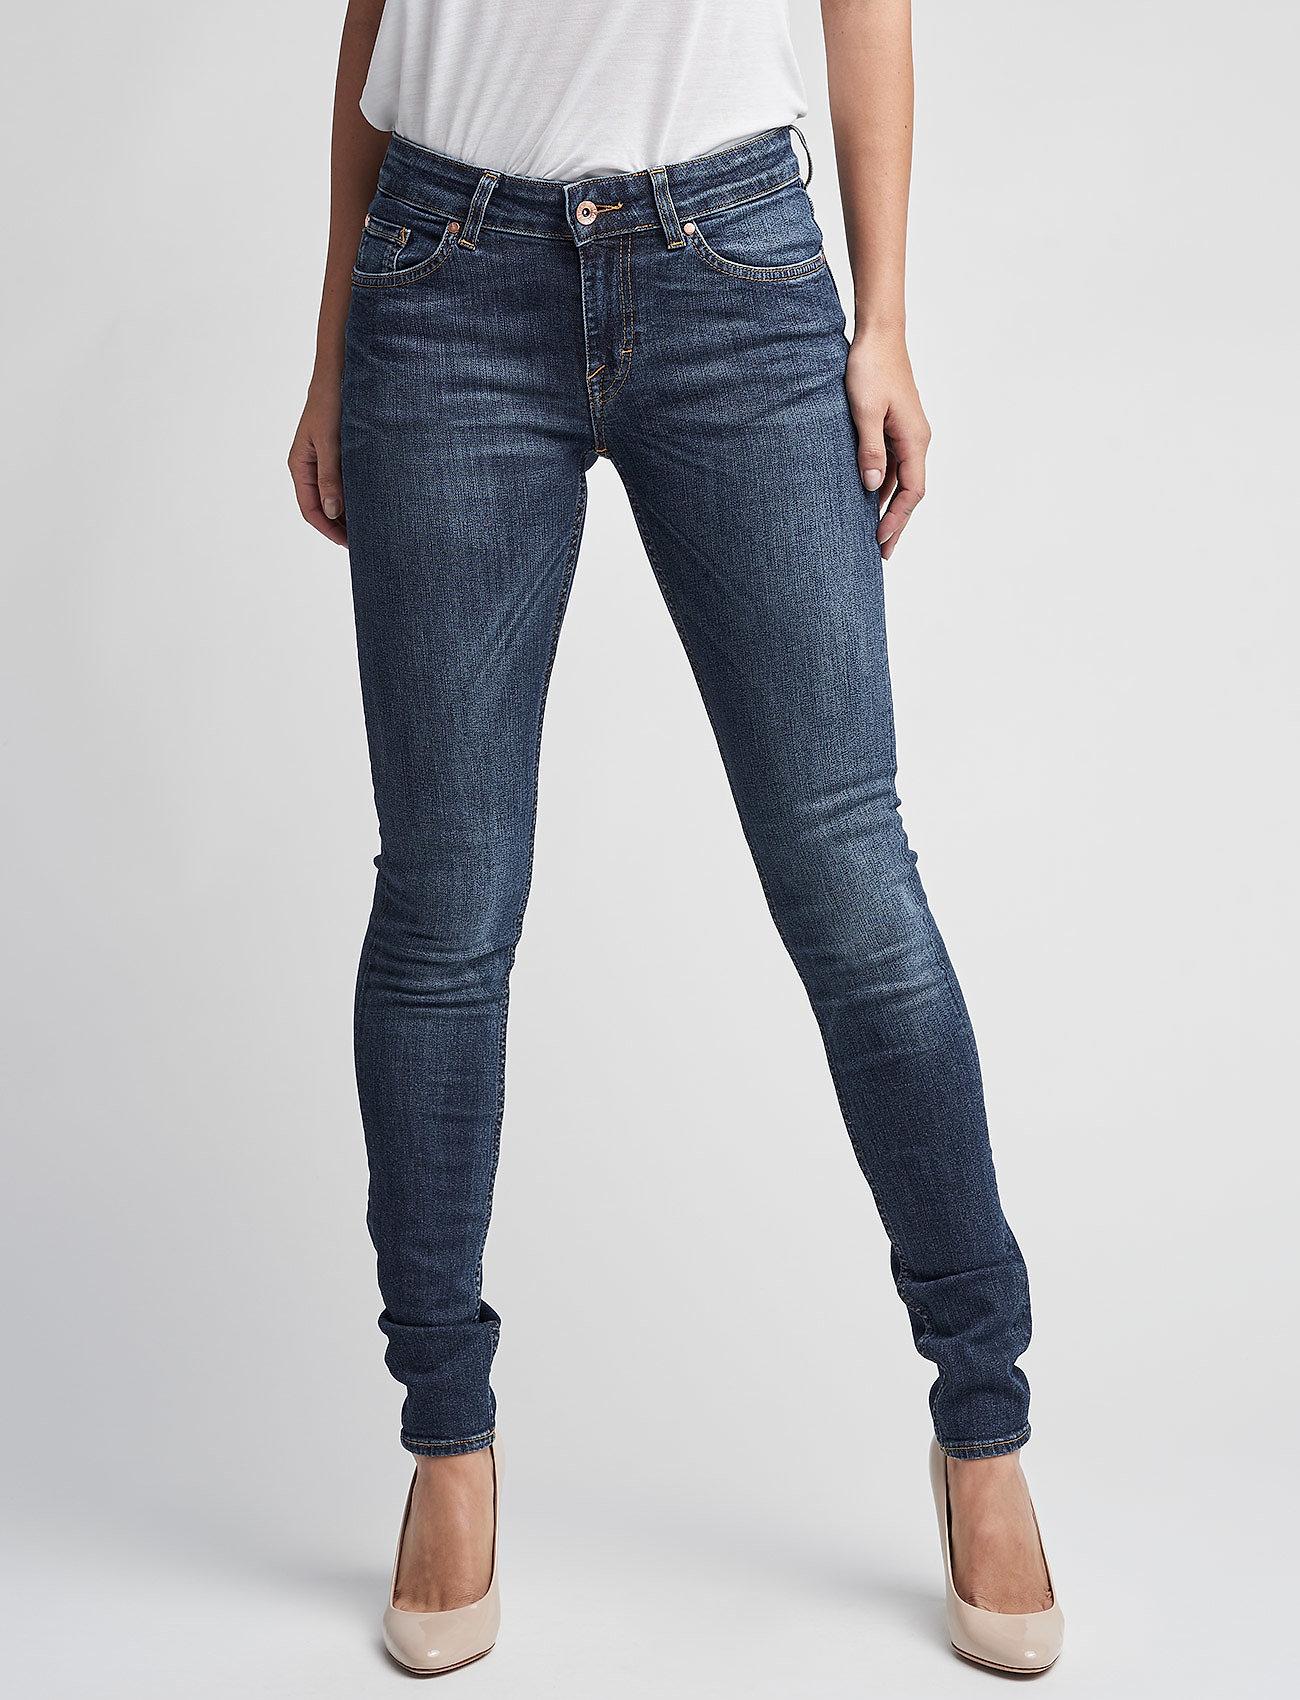 Of Sweden Slightdust BlueTiger Jeans Slightdust R5AjL34